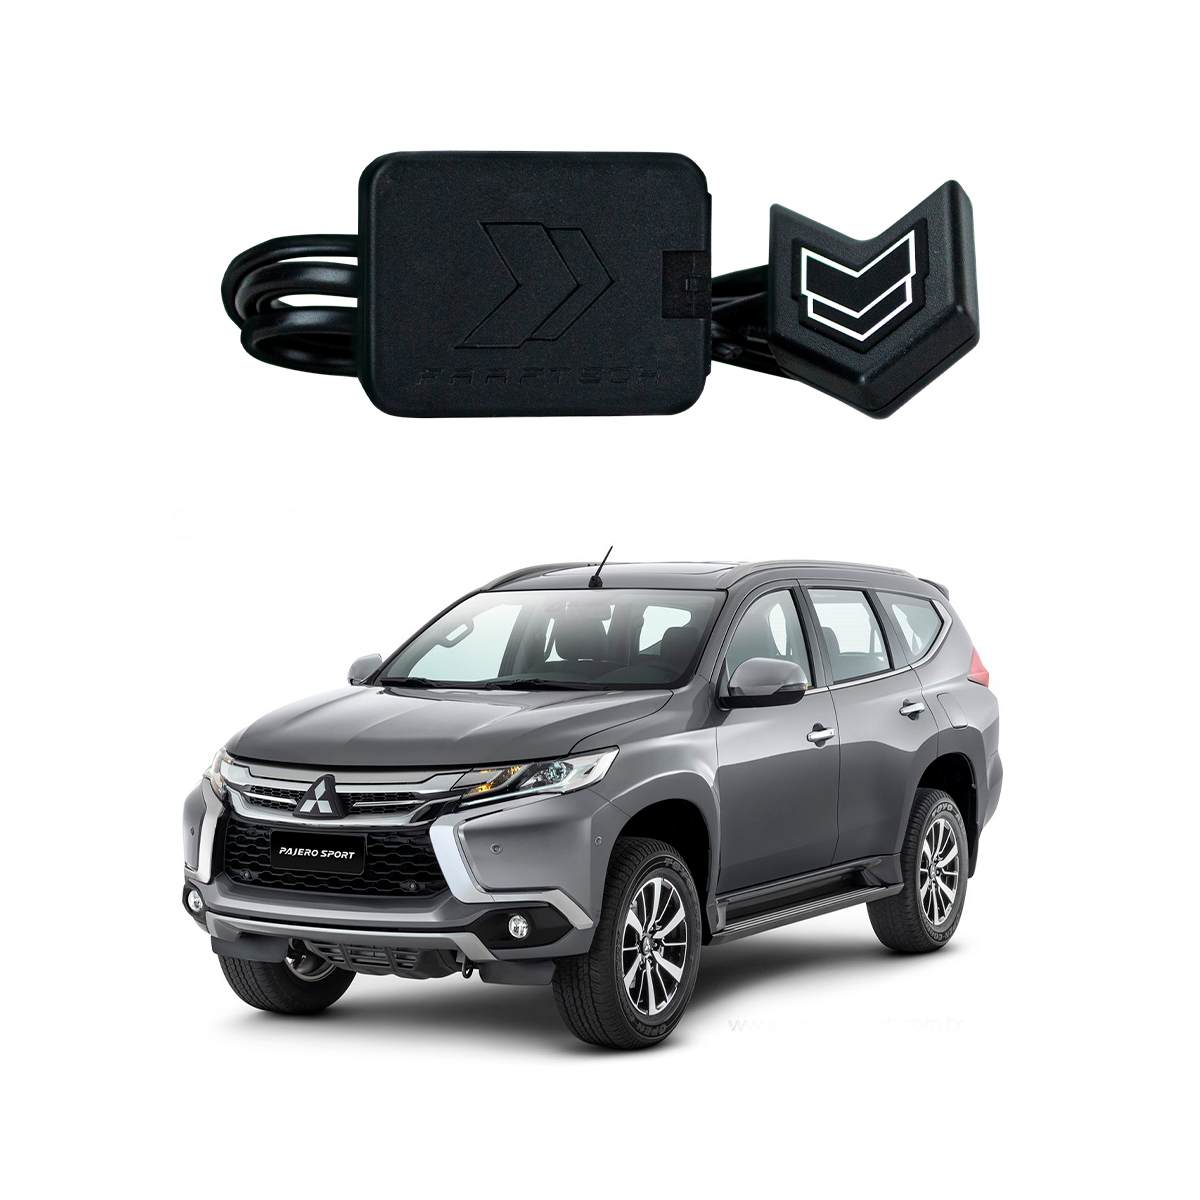 Chip de Pedal Shiftpower Para Mitsubishi Pajero Sport (Diesel)